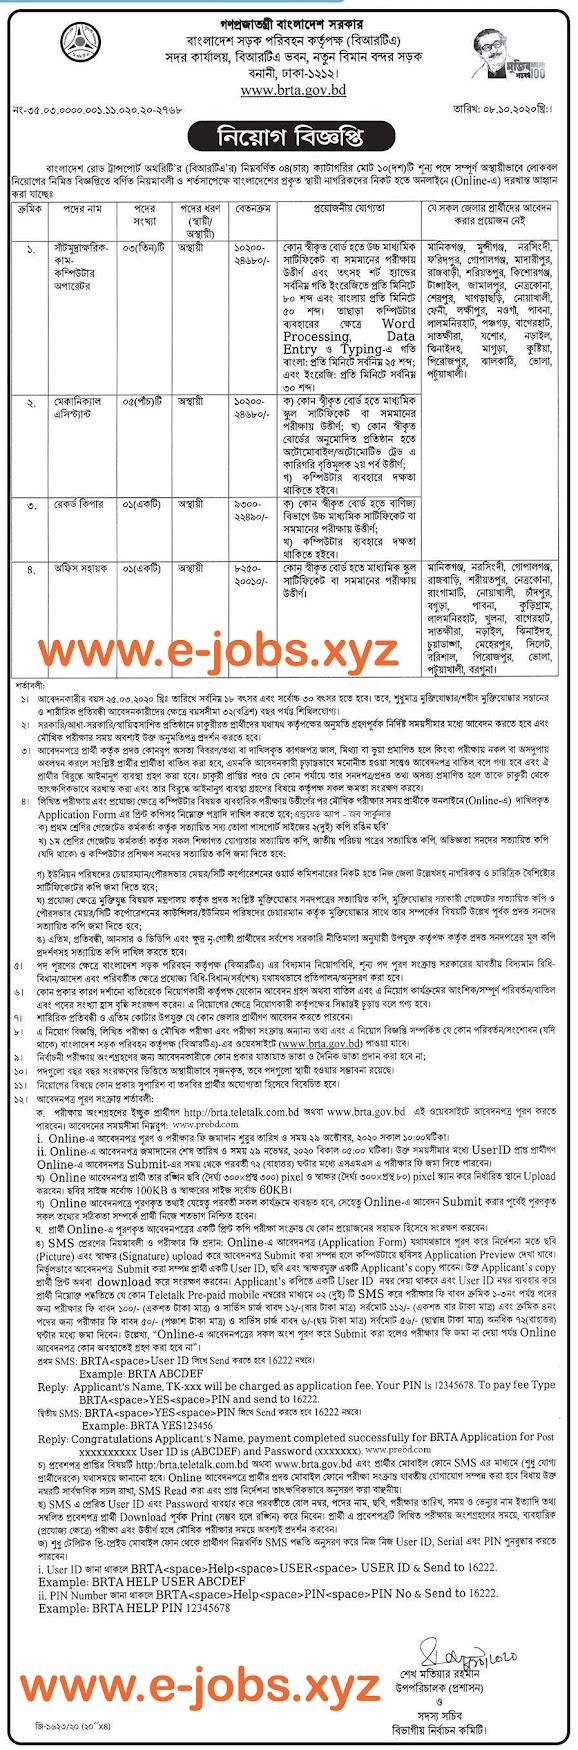 Job Circular published on Bangladesh Road Transport Authority